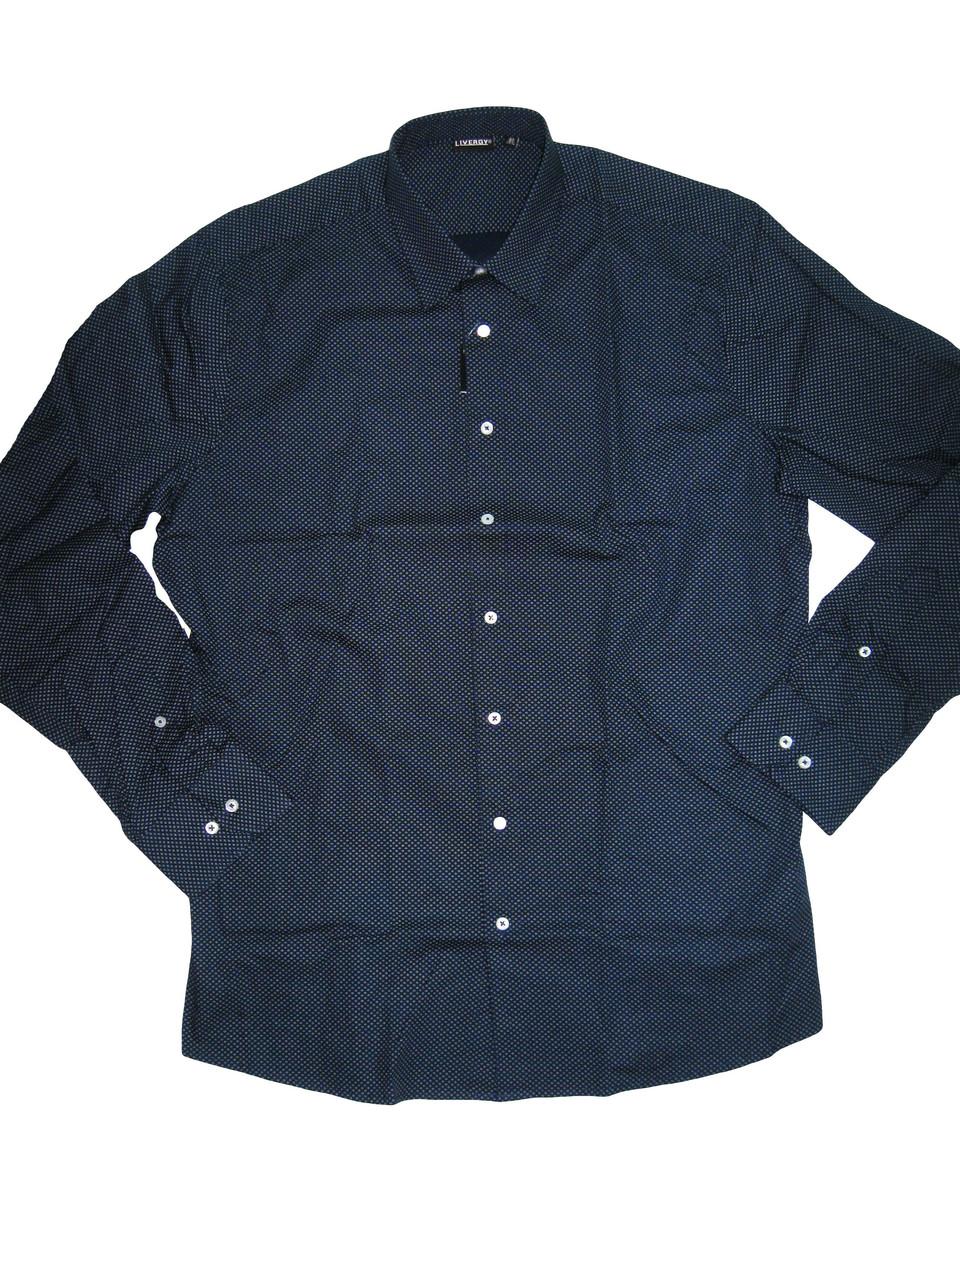 Рубашка мужская, Nobel Lauge, размер 43,, арт. М-178